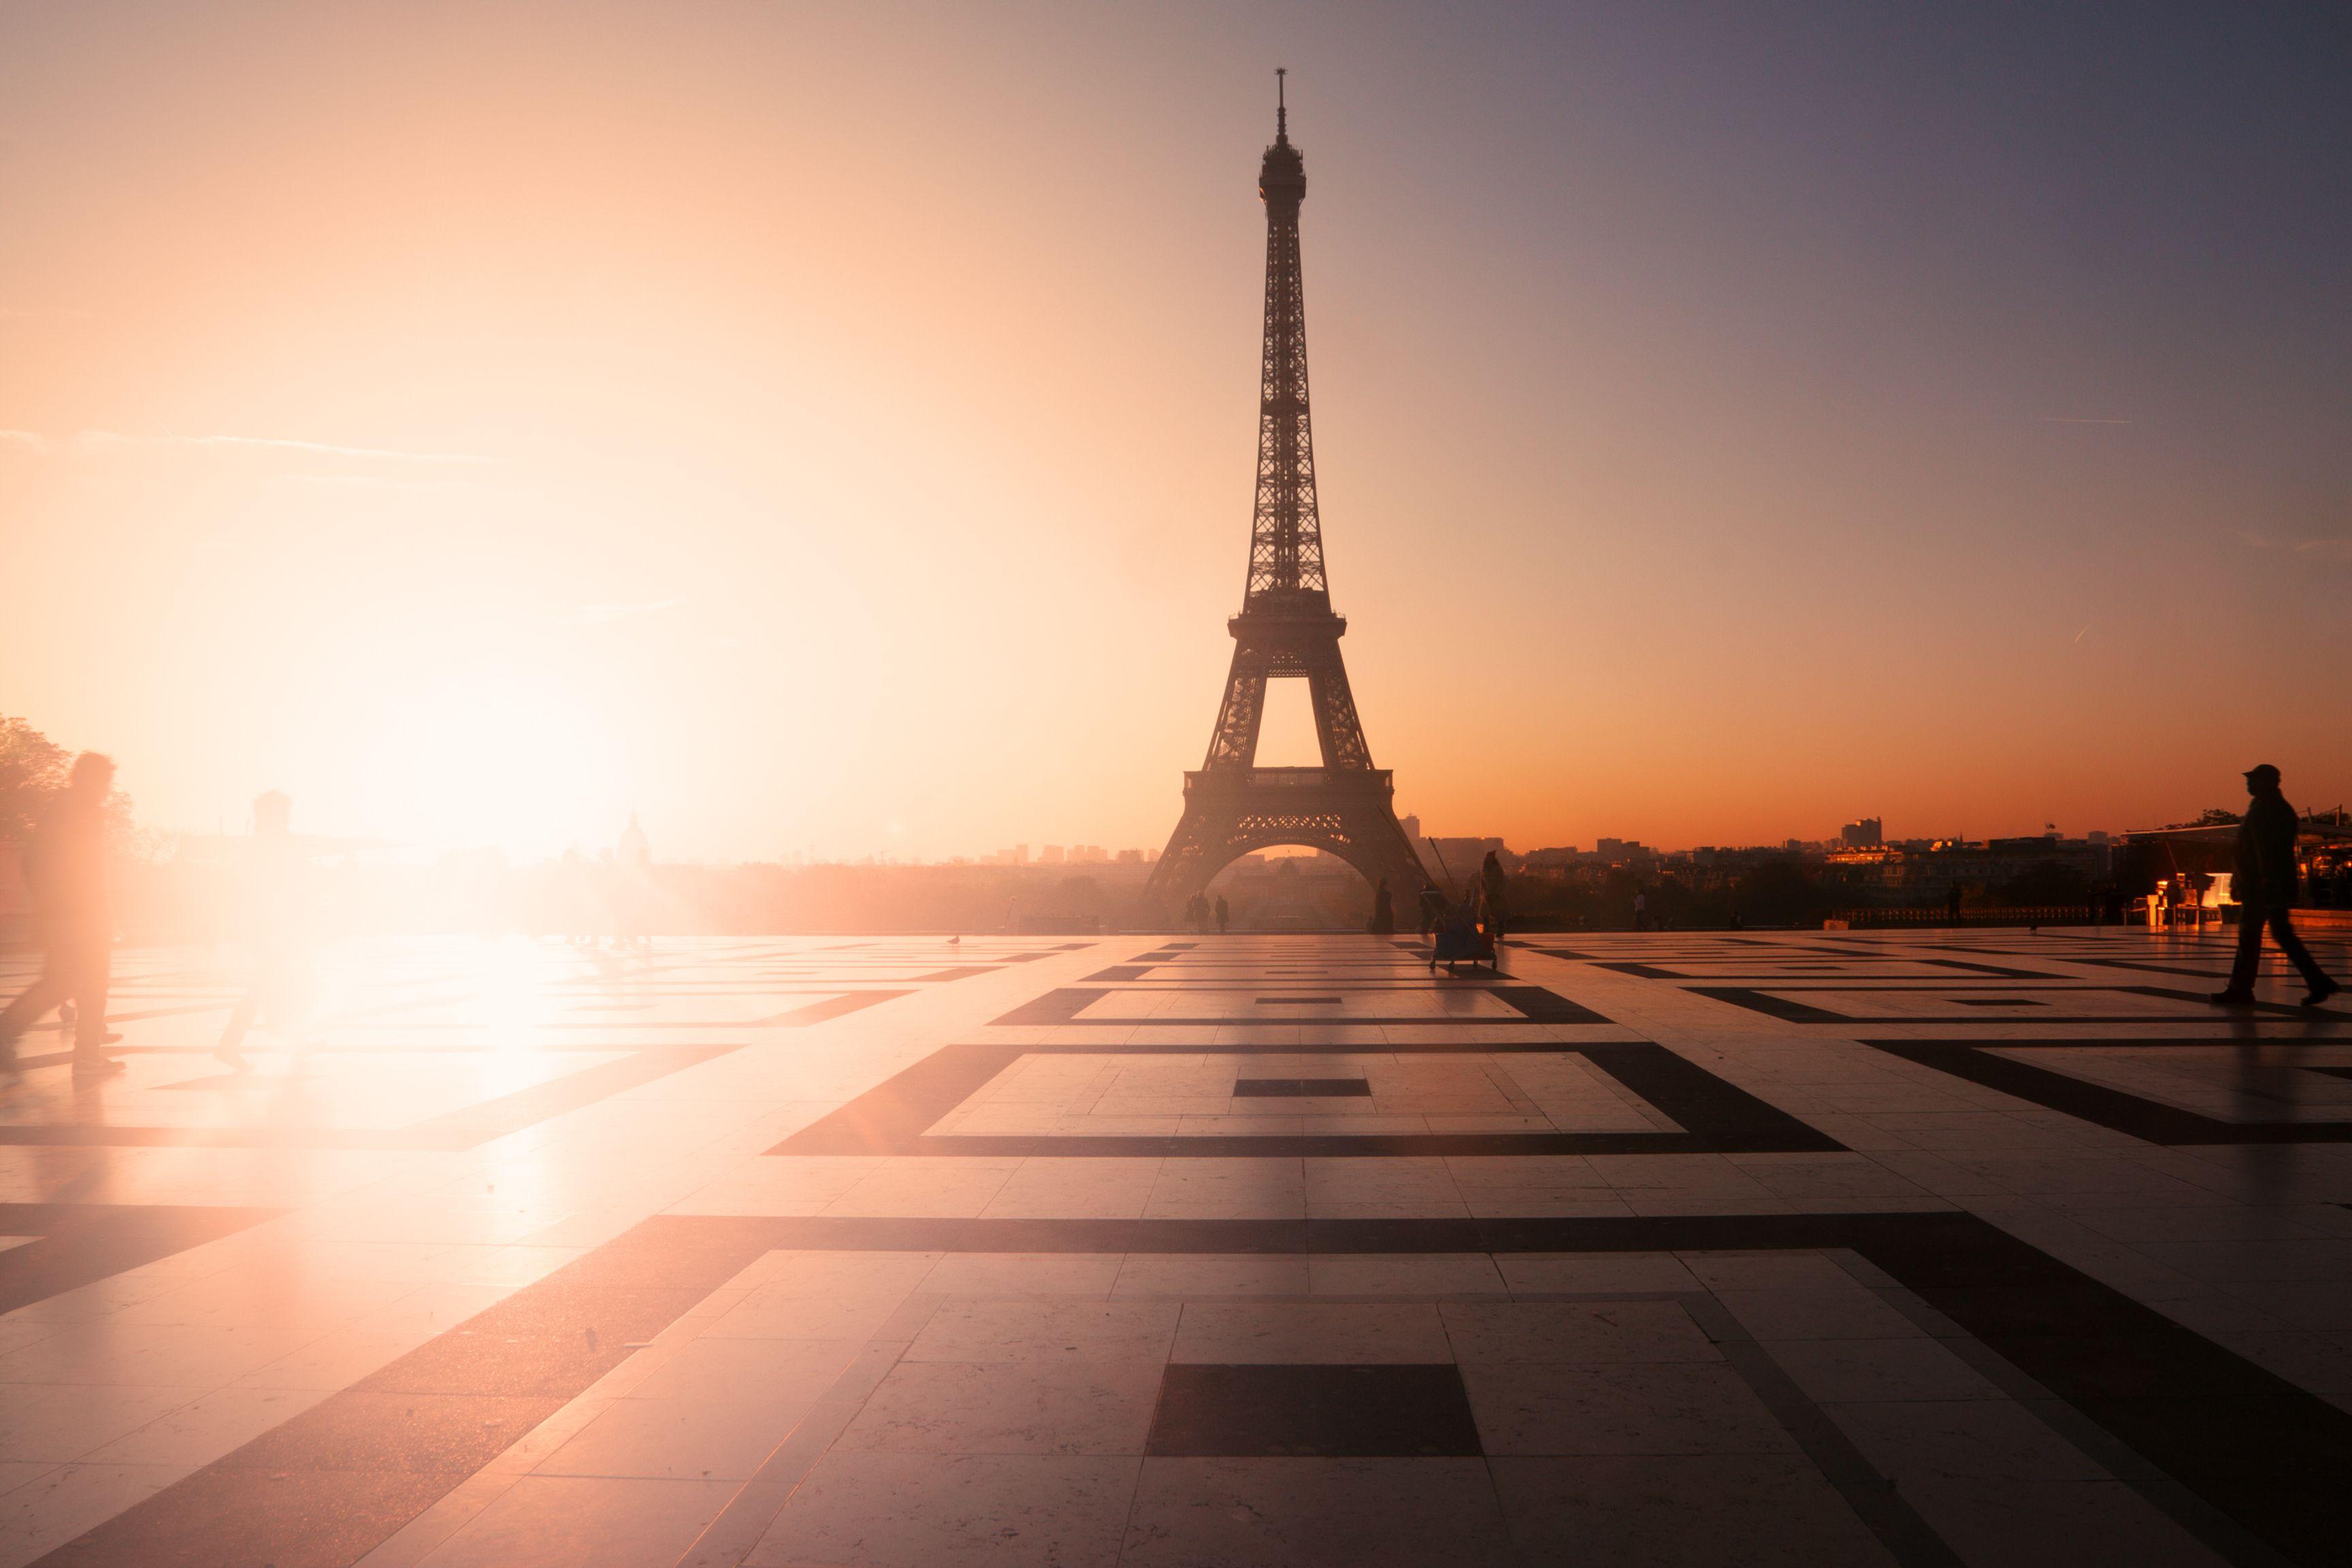 Eiffel Tower sunset Paris #ParisCityVision #Paris #VisitParis #France #Sunset #Trocadero